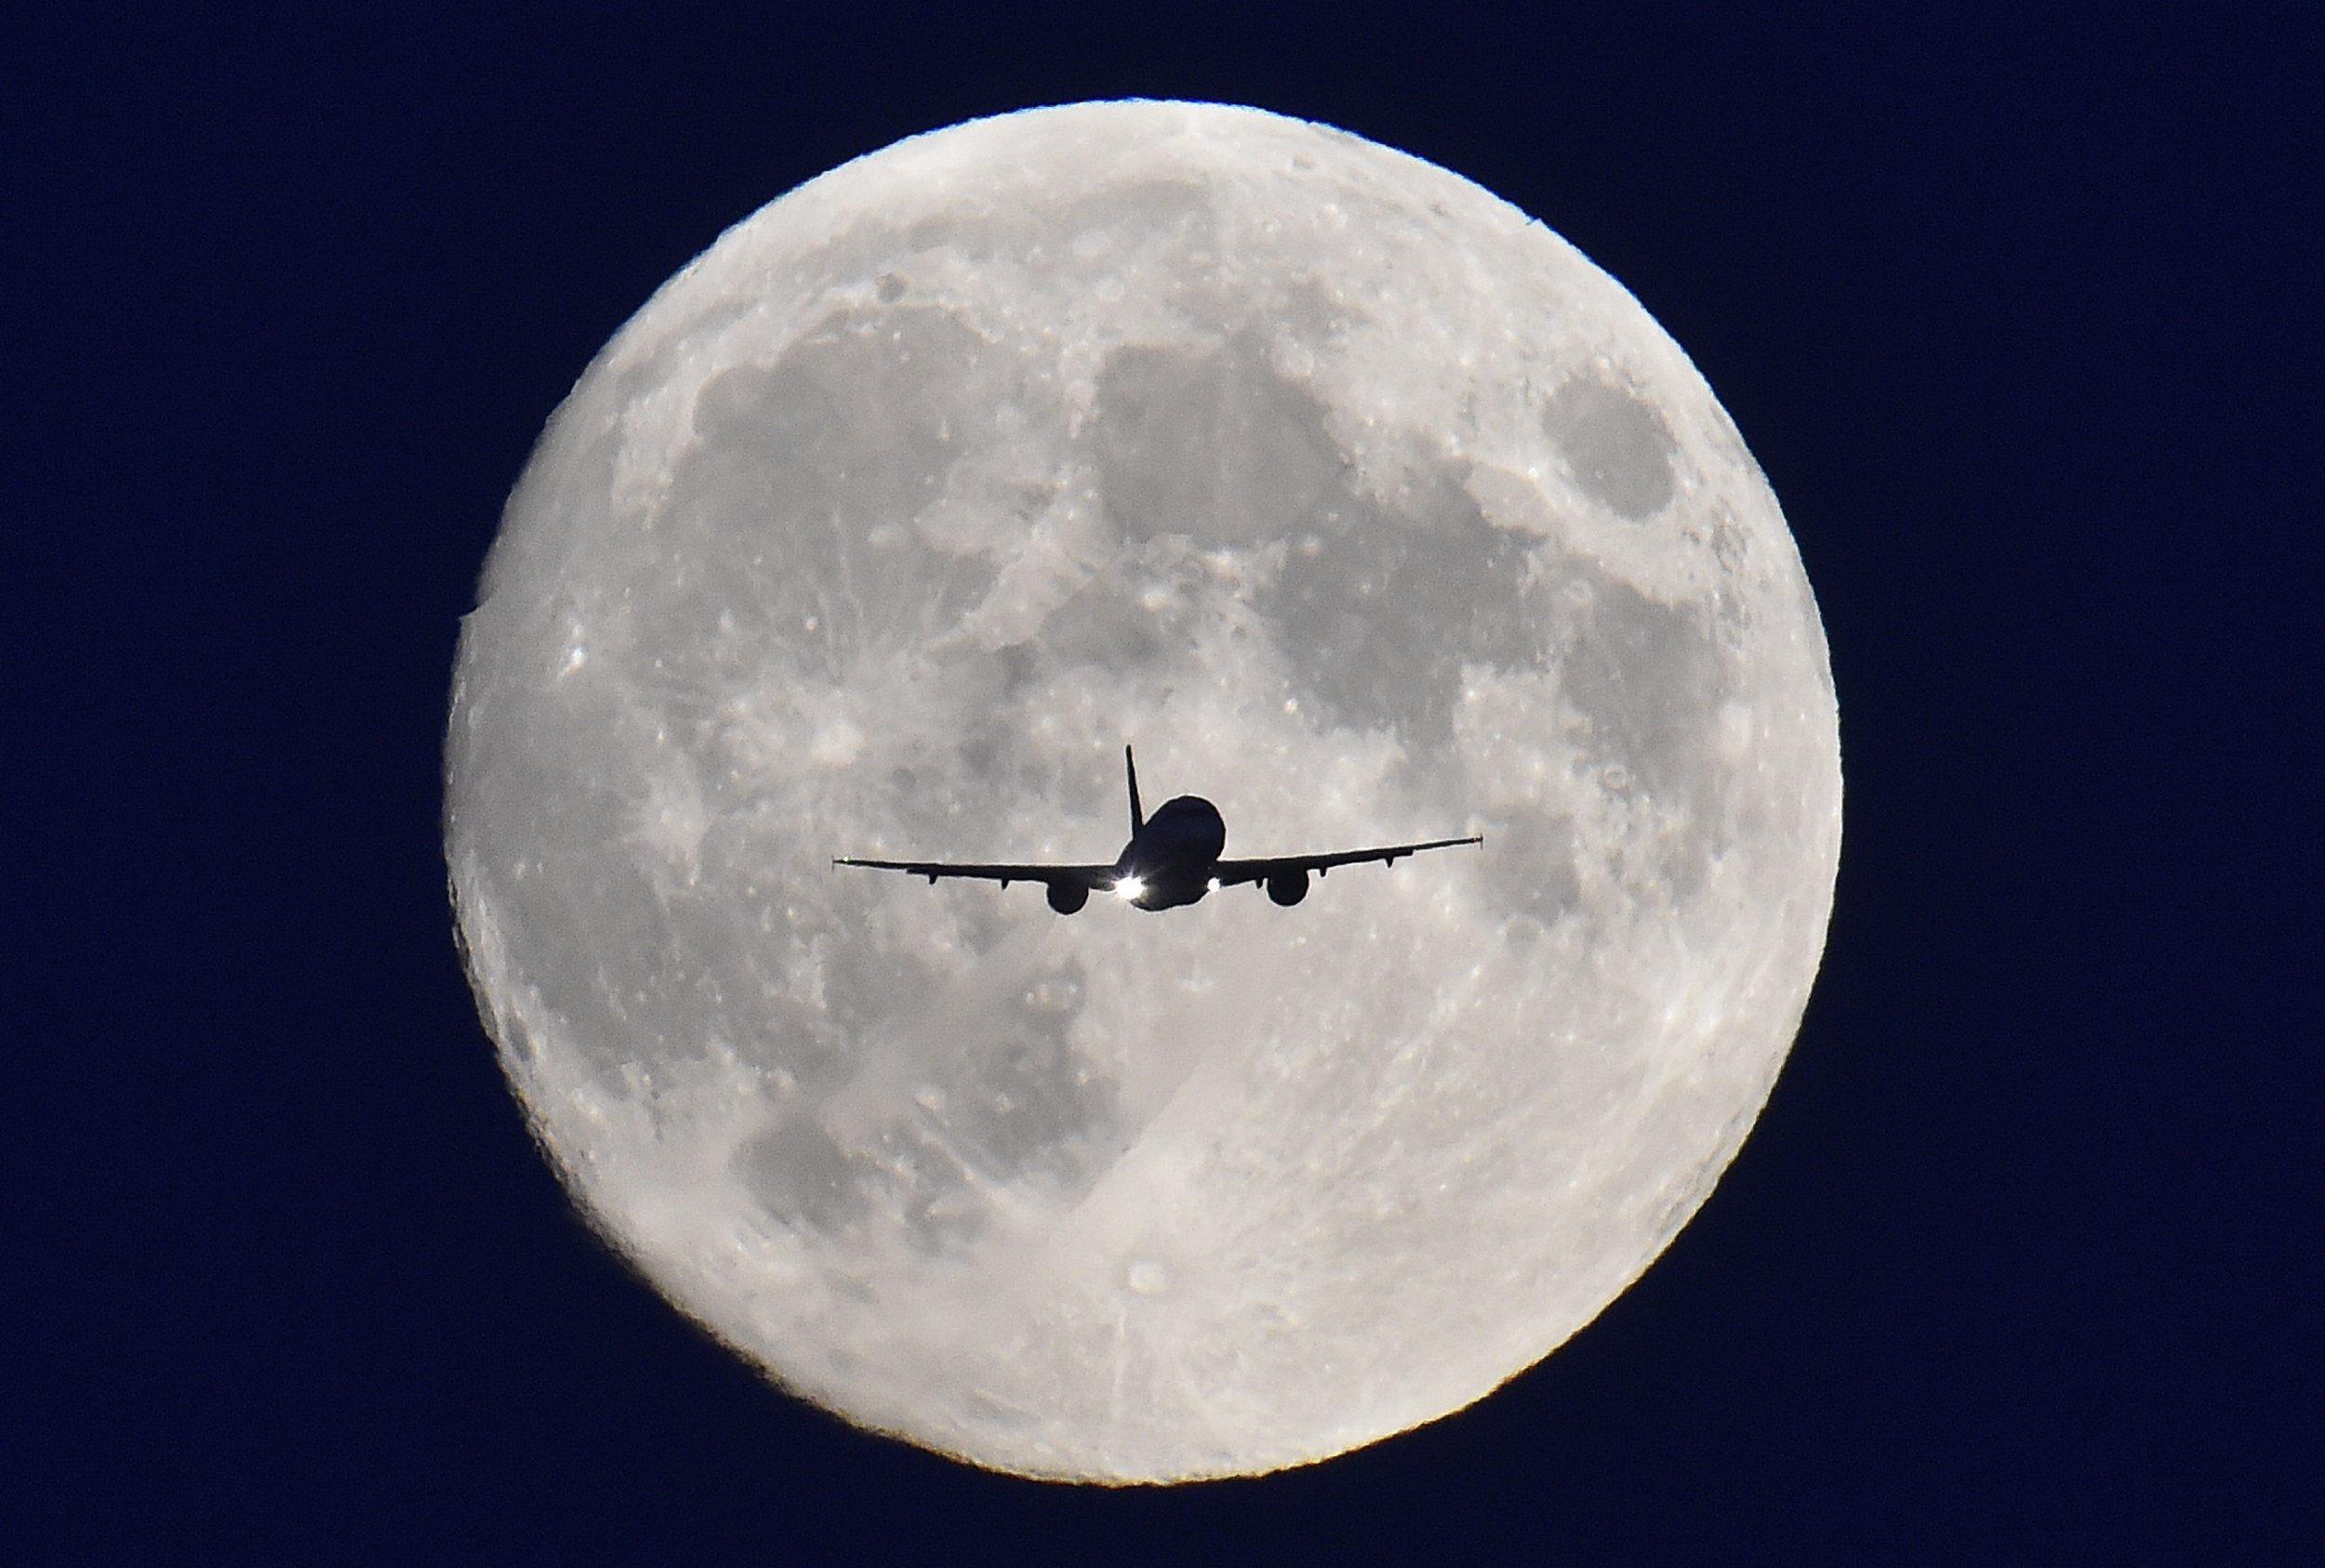 Climate Change Adds to Flight Time for Transatlantic Journeys